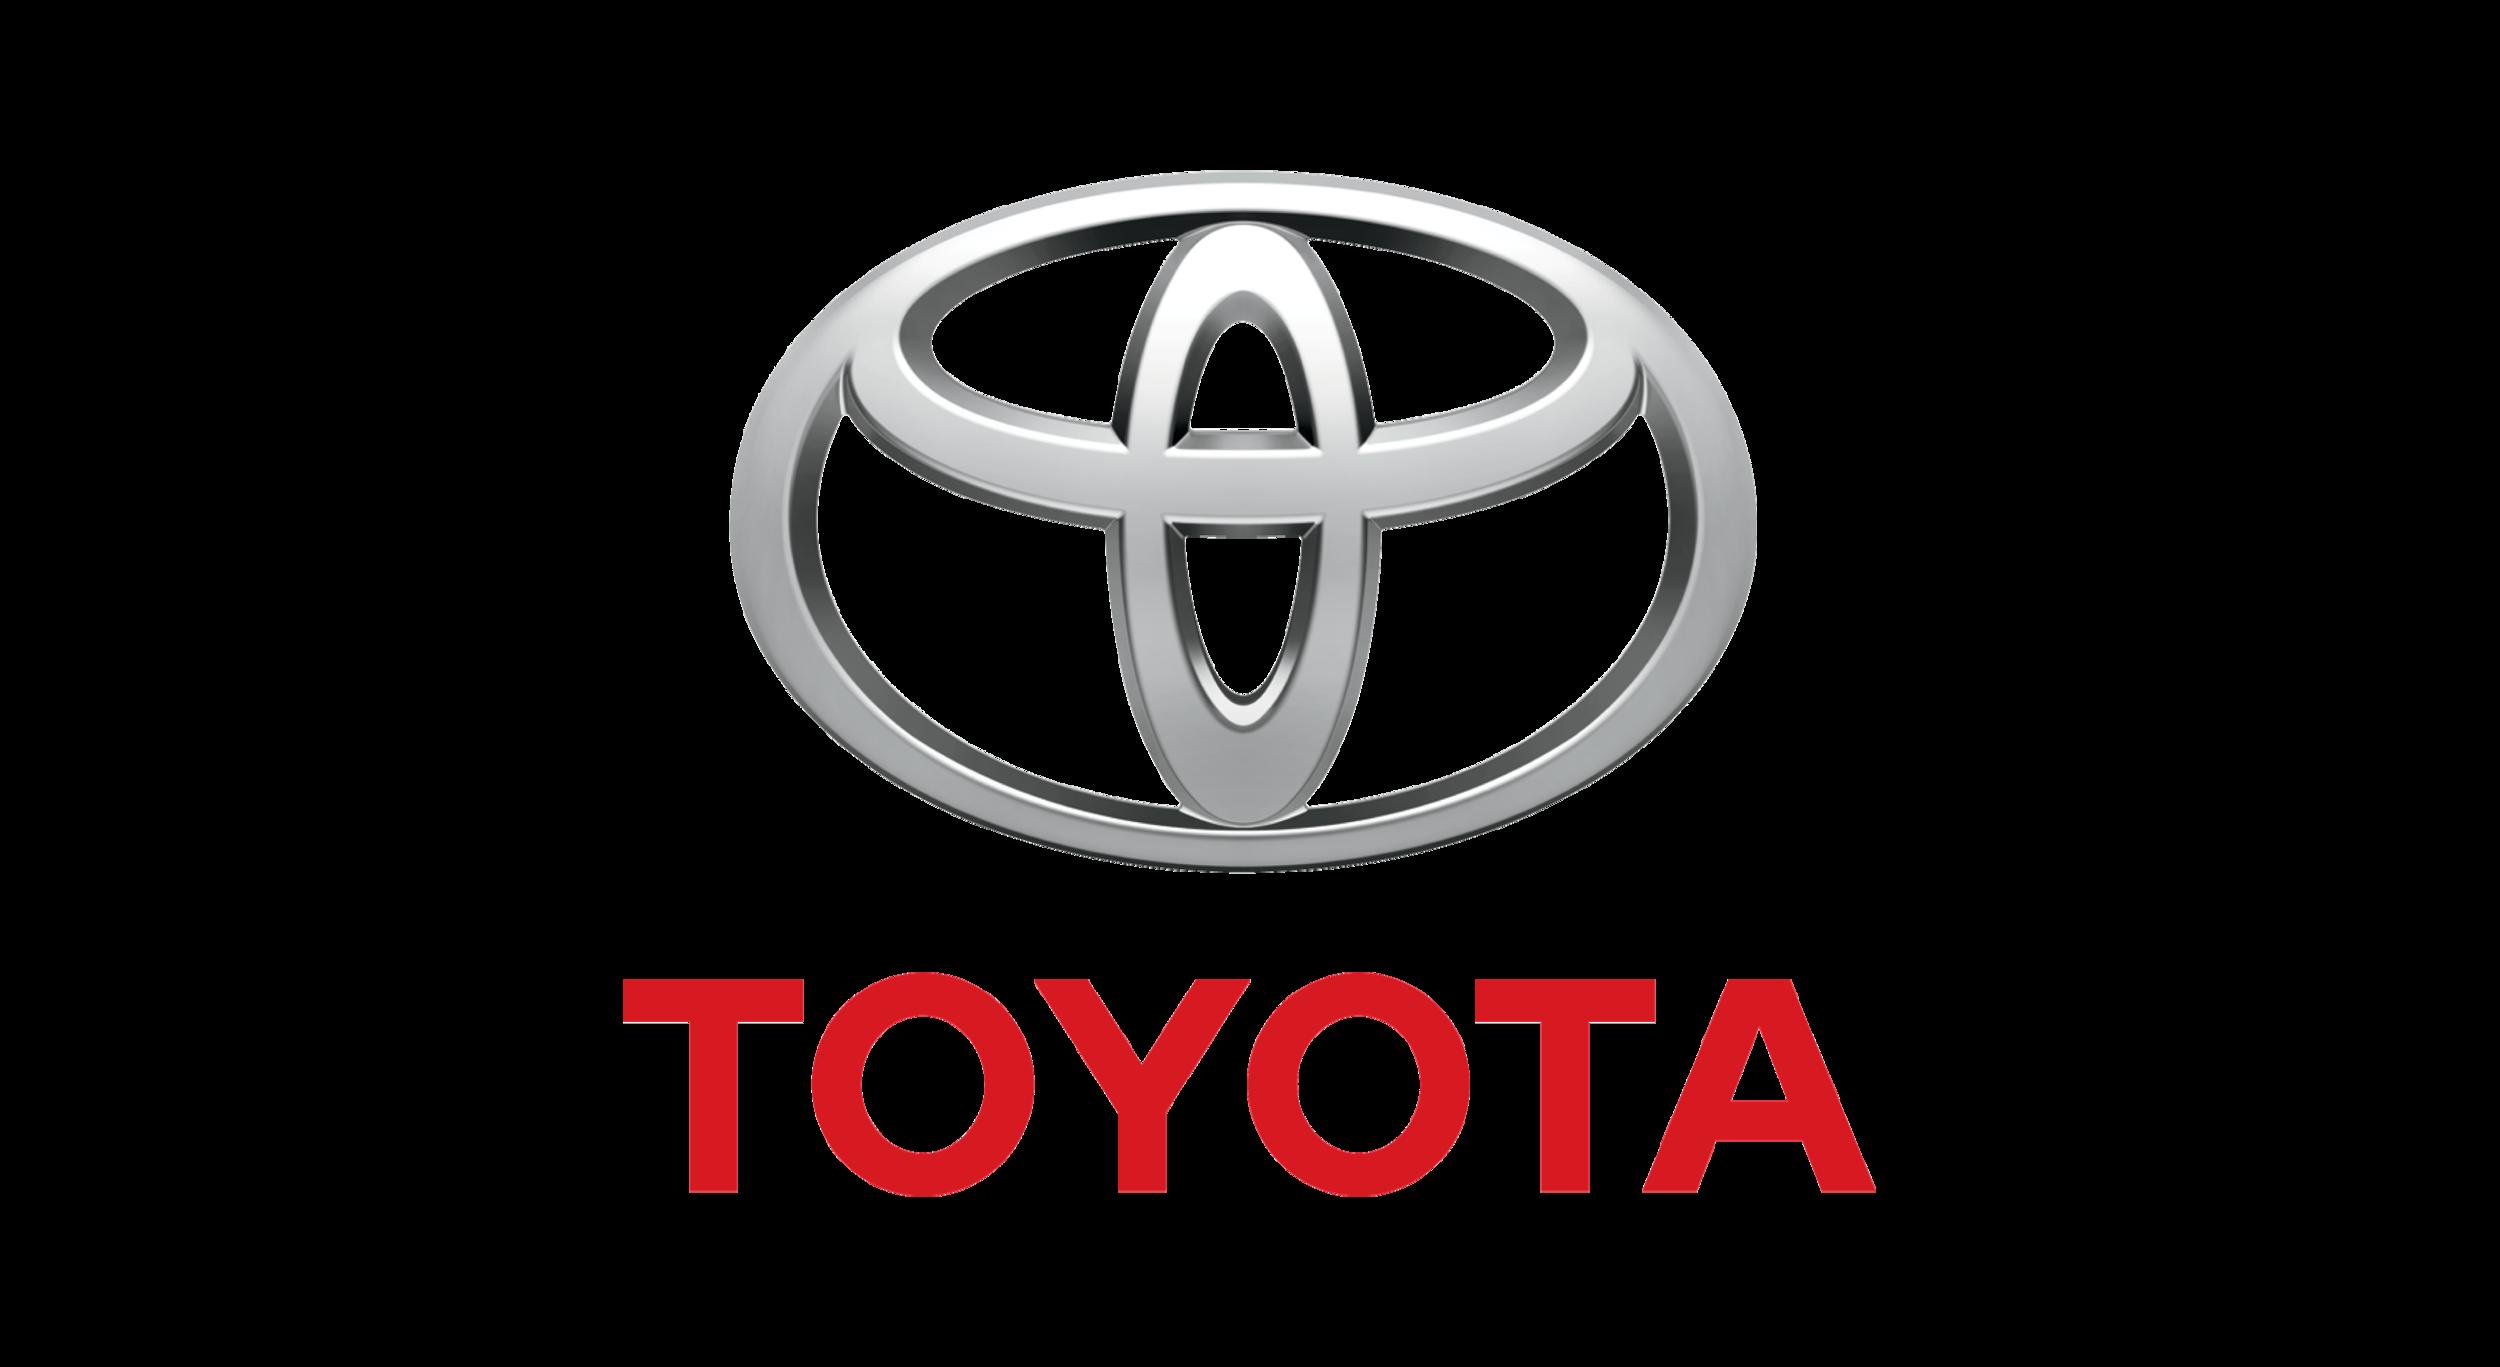 Toyota-text-logo-3000x550.png